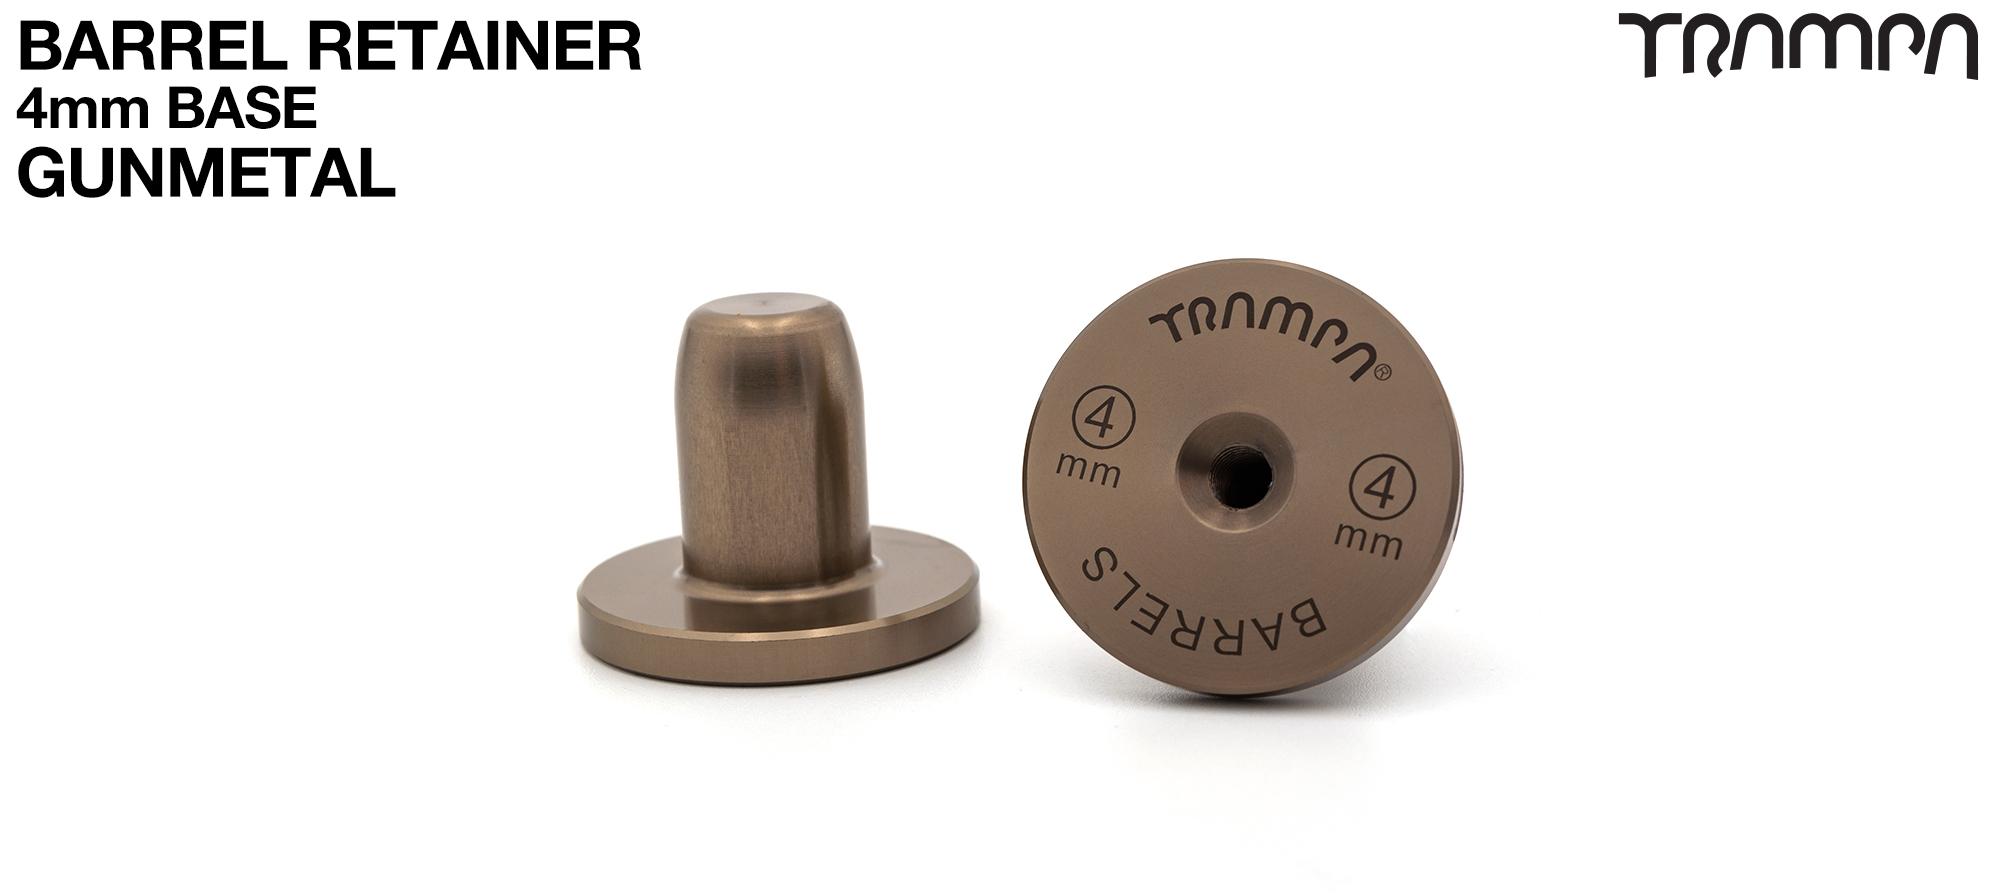 BARRELS Retainer 4mm BASE - GUNMETAL